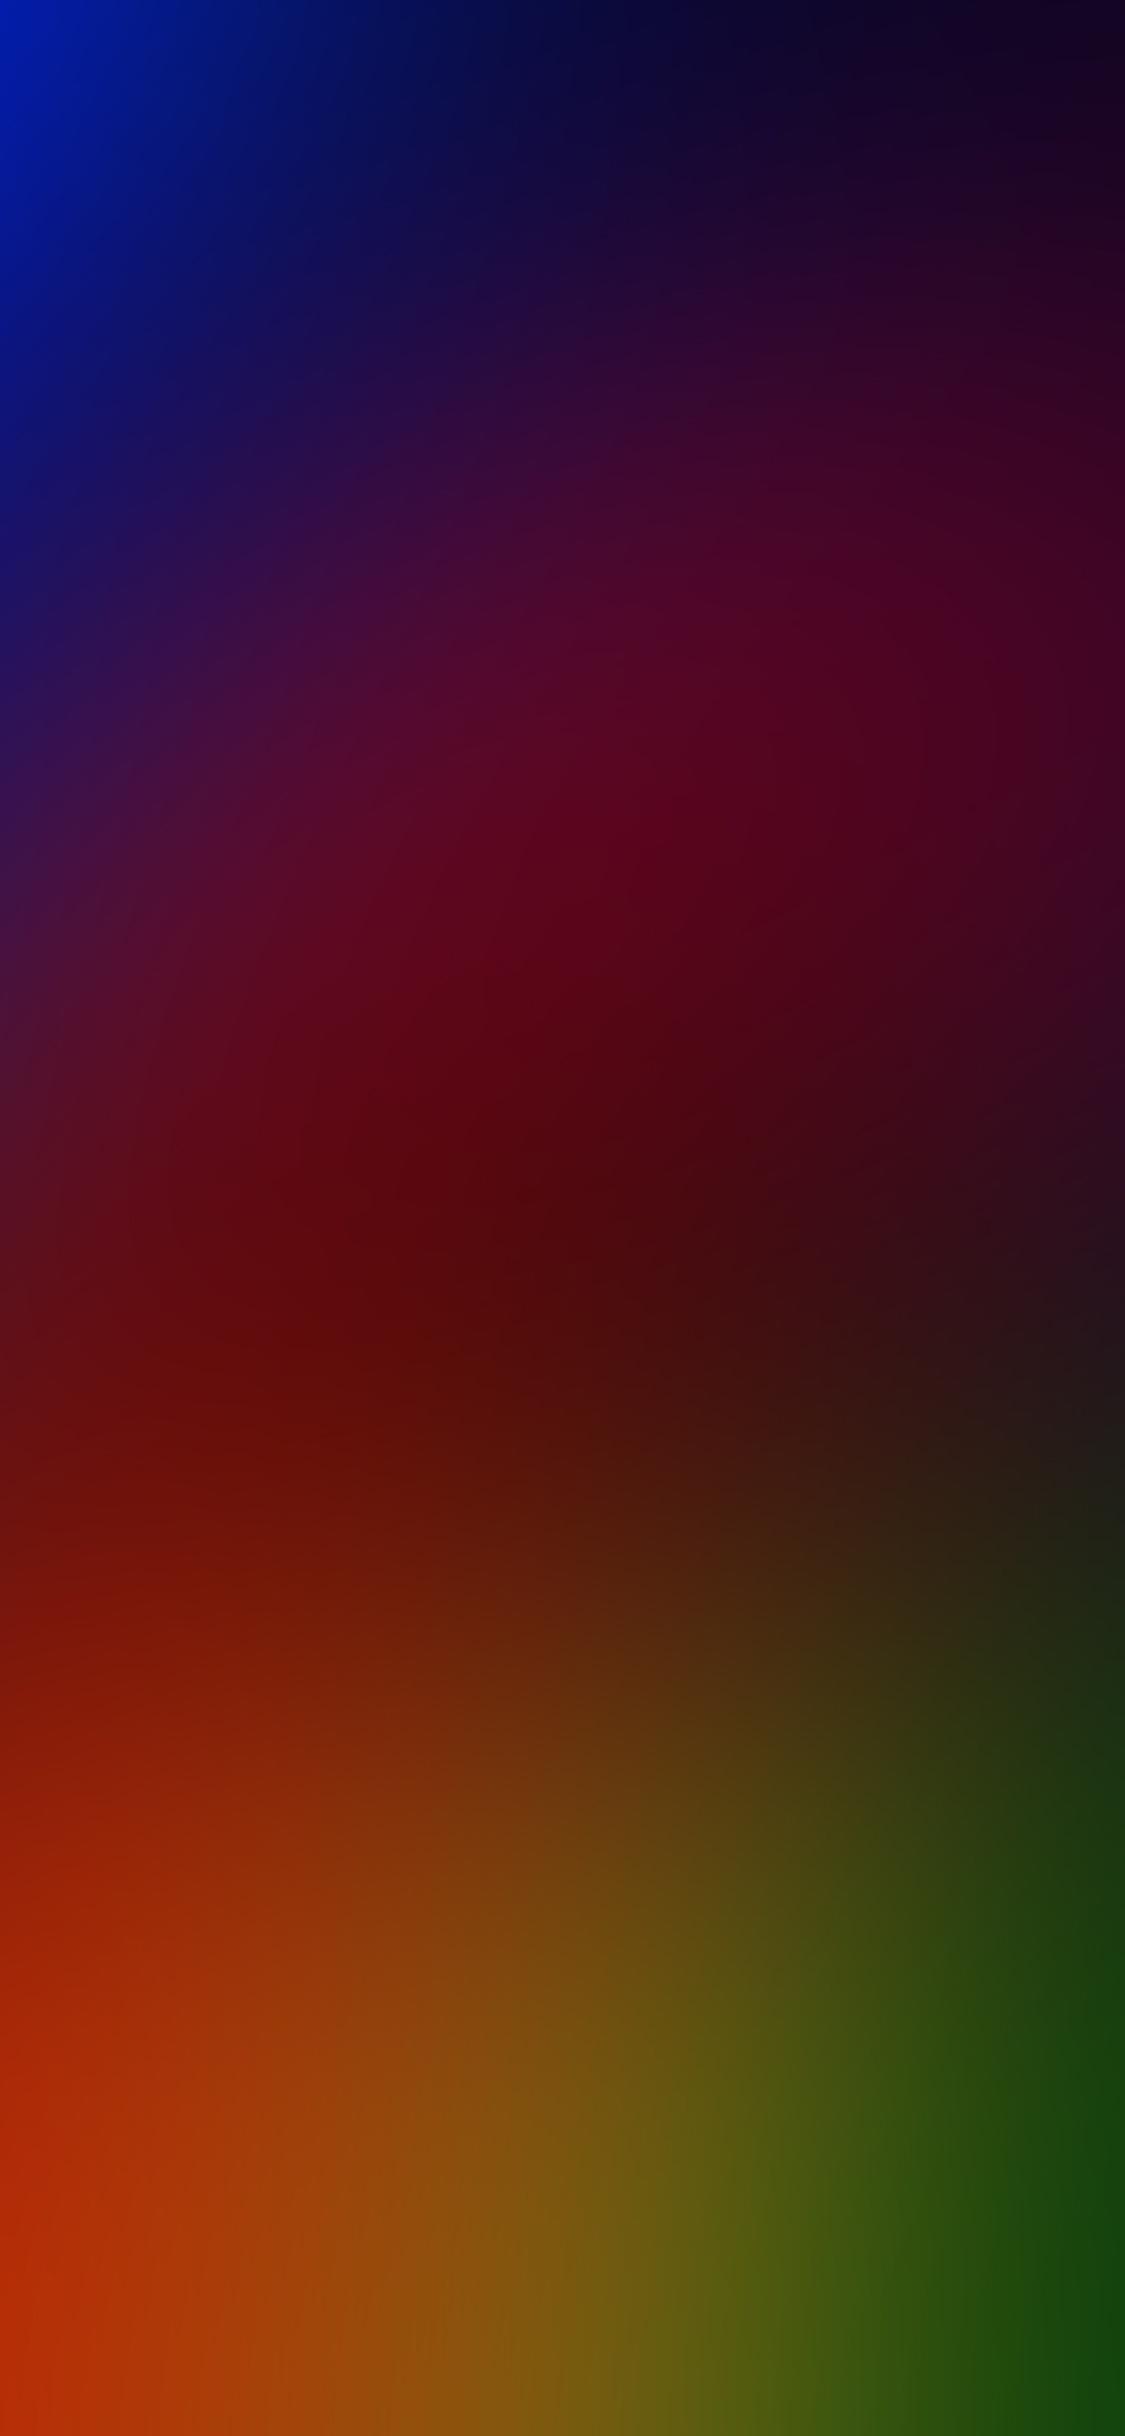 iPhoneXpapers.com-Apple-iPhone-wallpaper-sf74-rainbow-dark-after-rain-gradation-blur